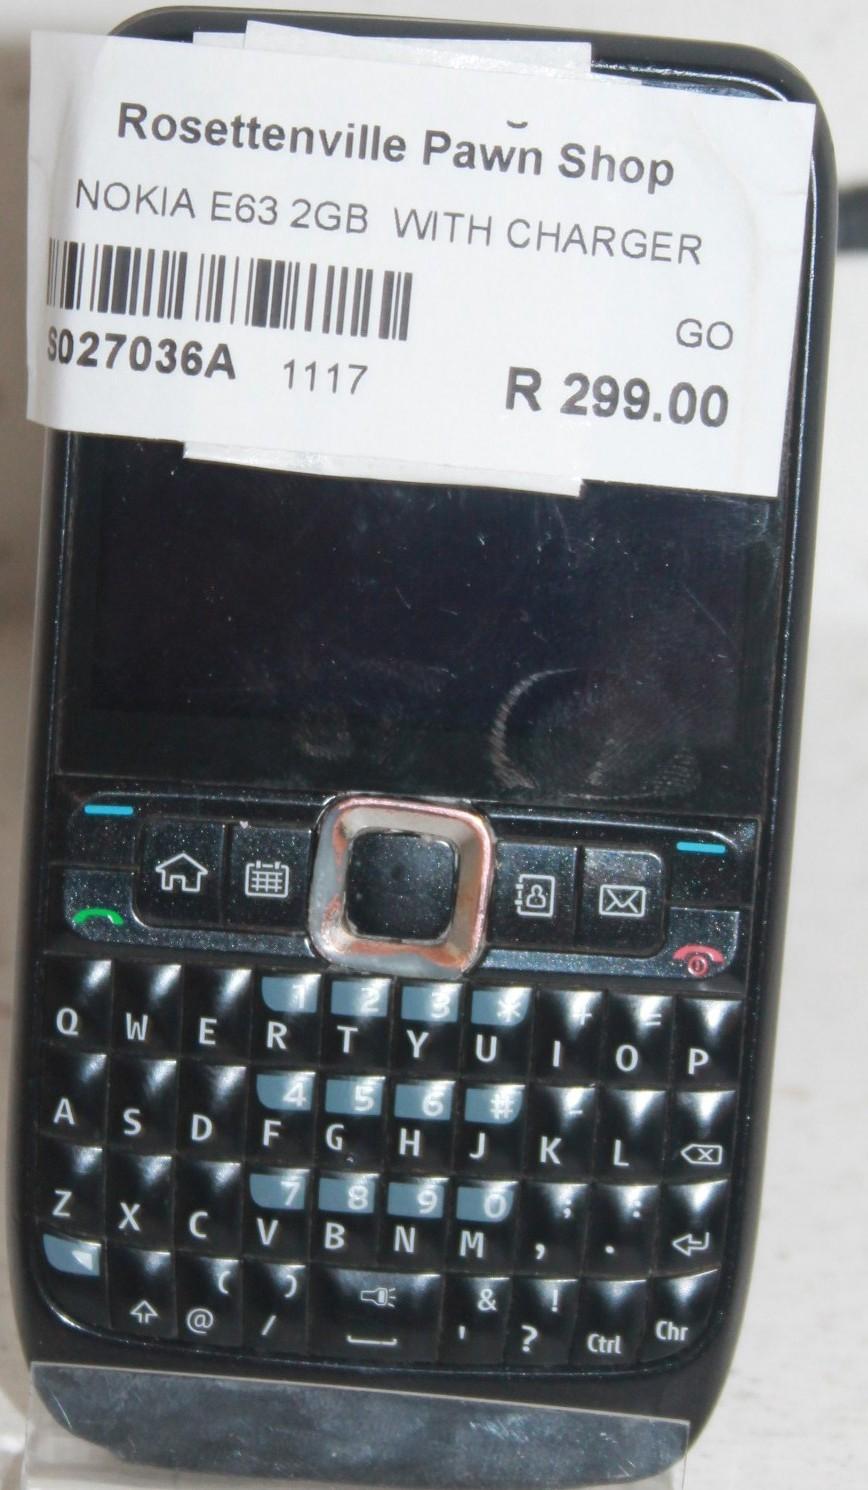 Nokia E63 S027036a #Rosettenvillepawnshop